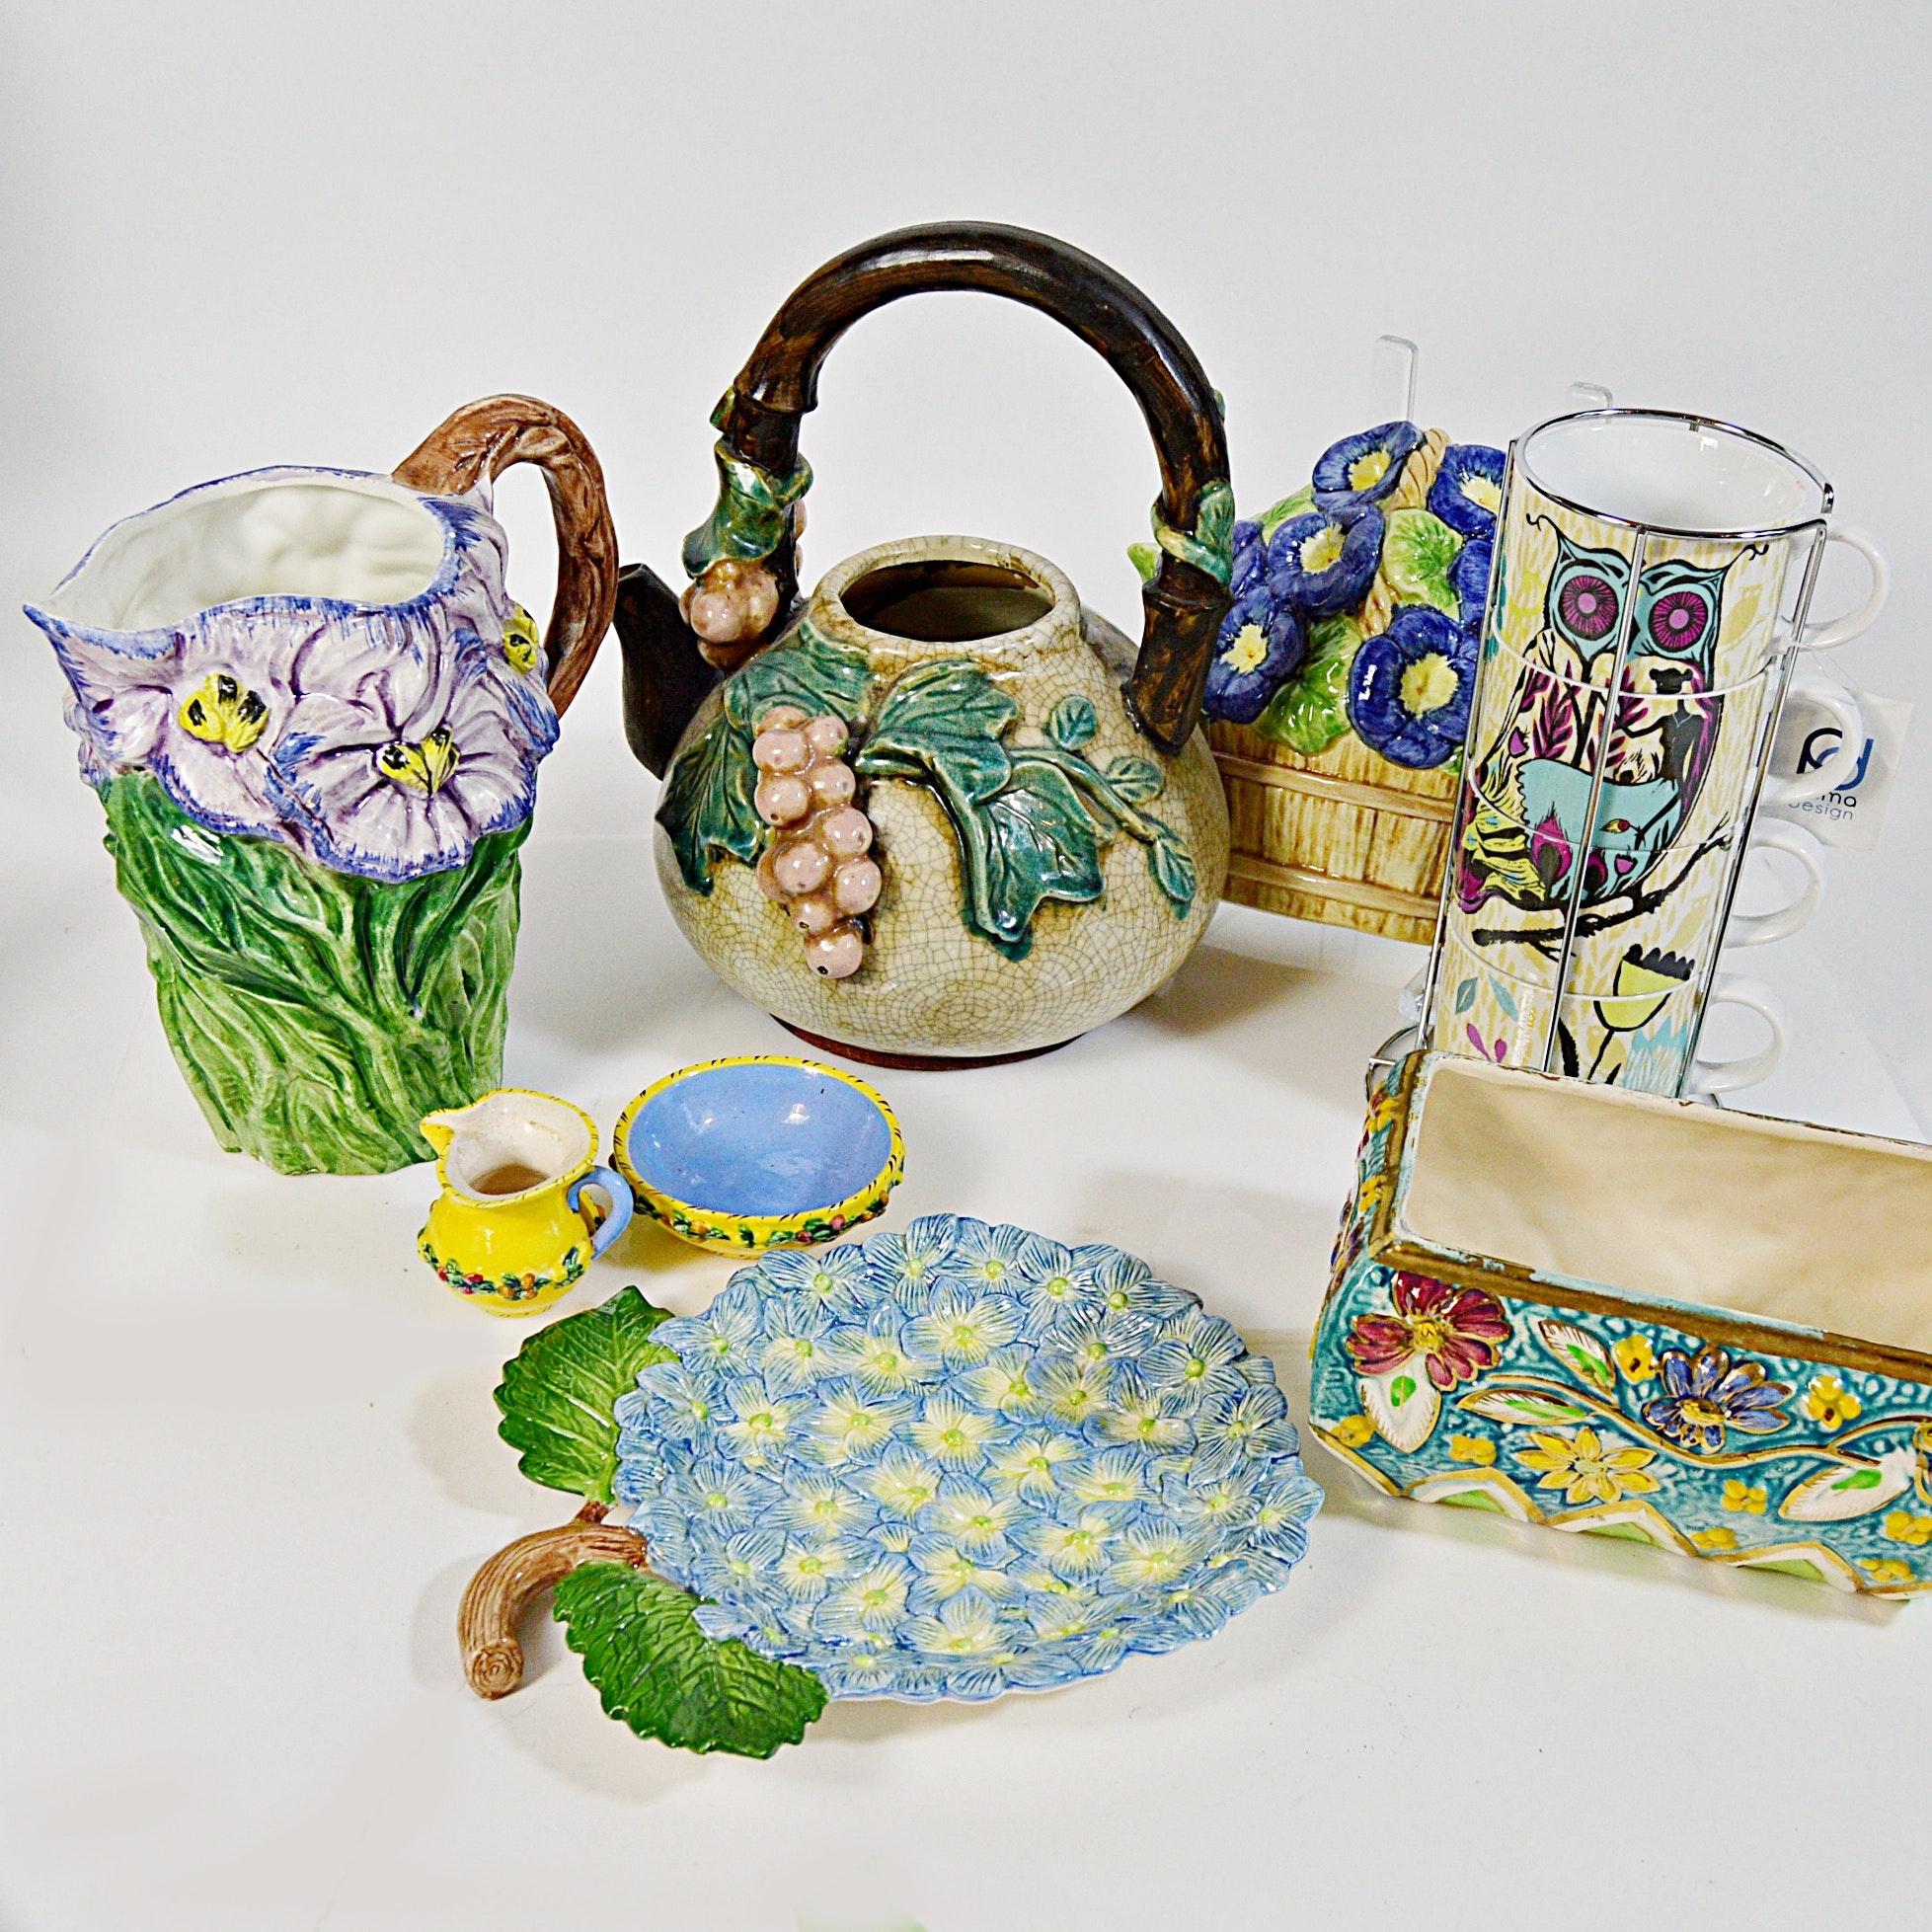 Majolica Style Tableware and Decor